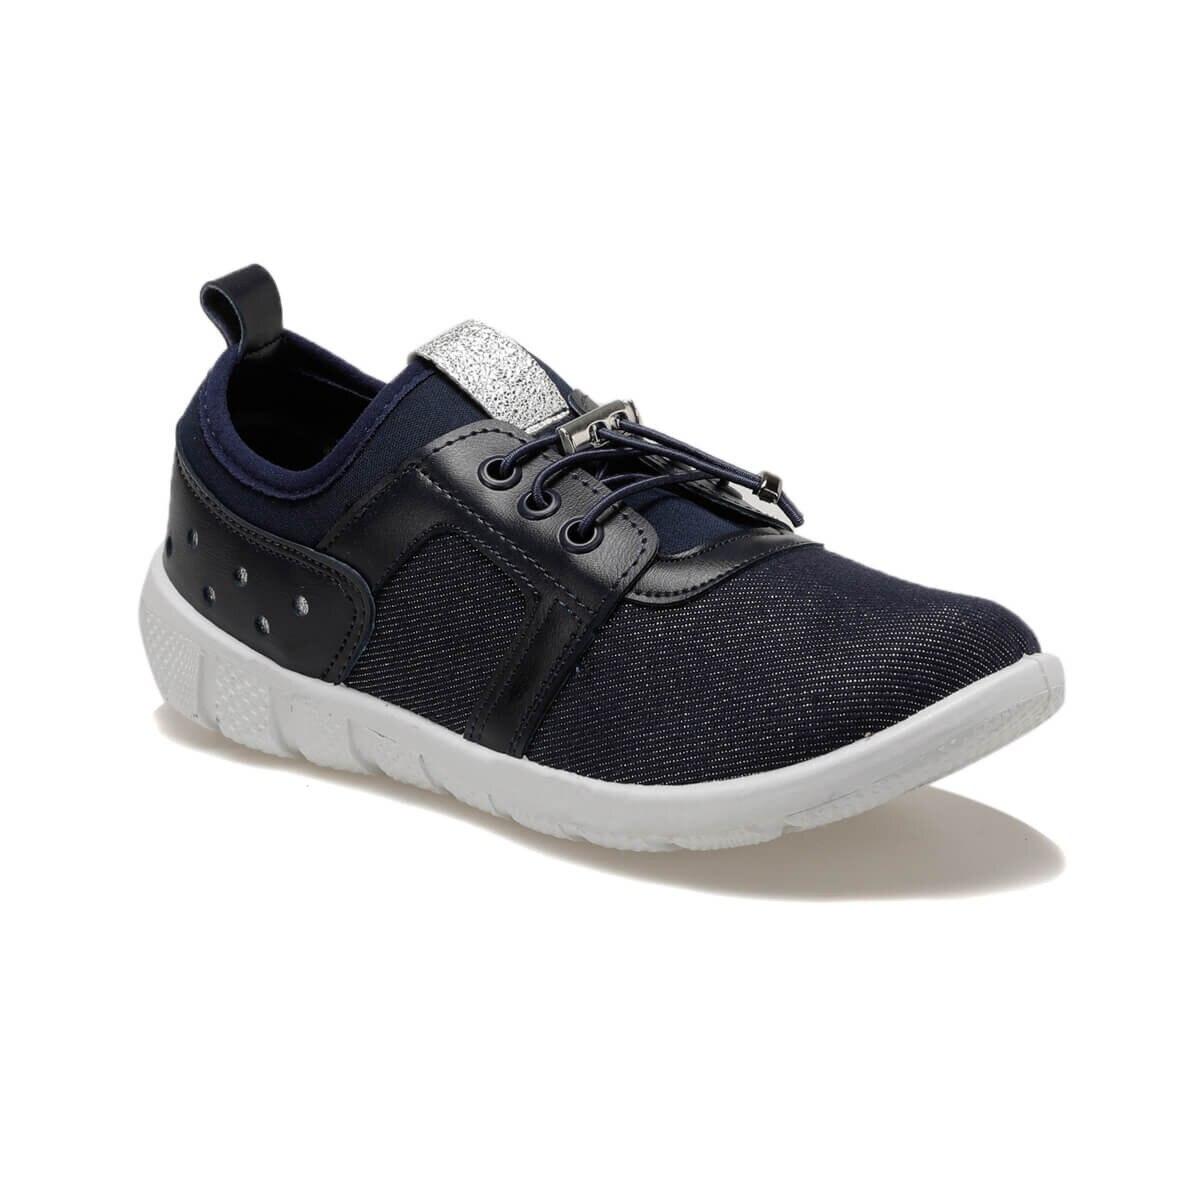 FLO 92.314862PZ Navy Blue Women 'S Sneaker Polaris